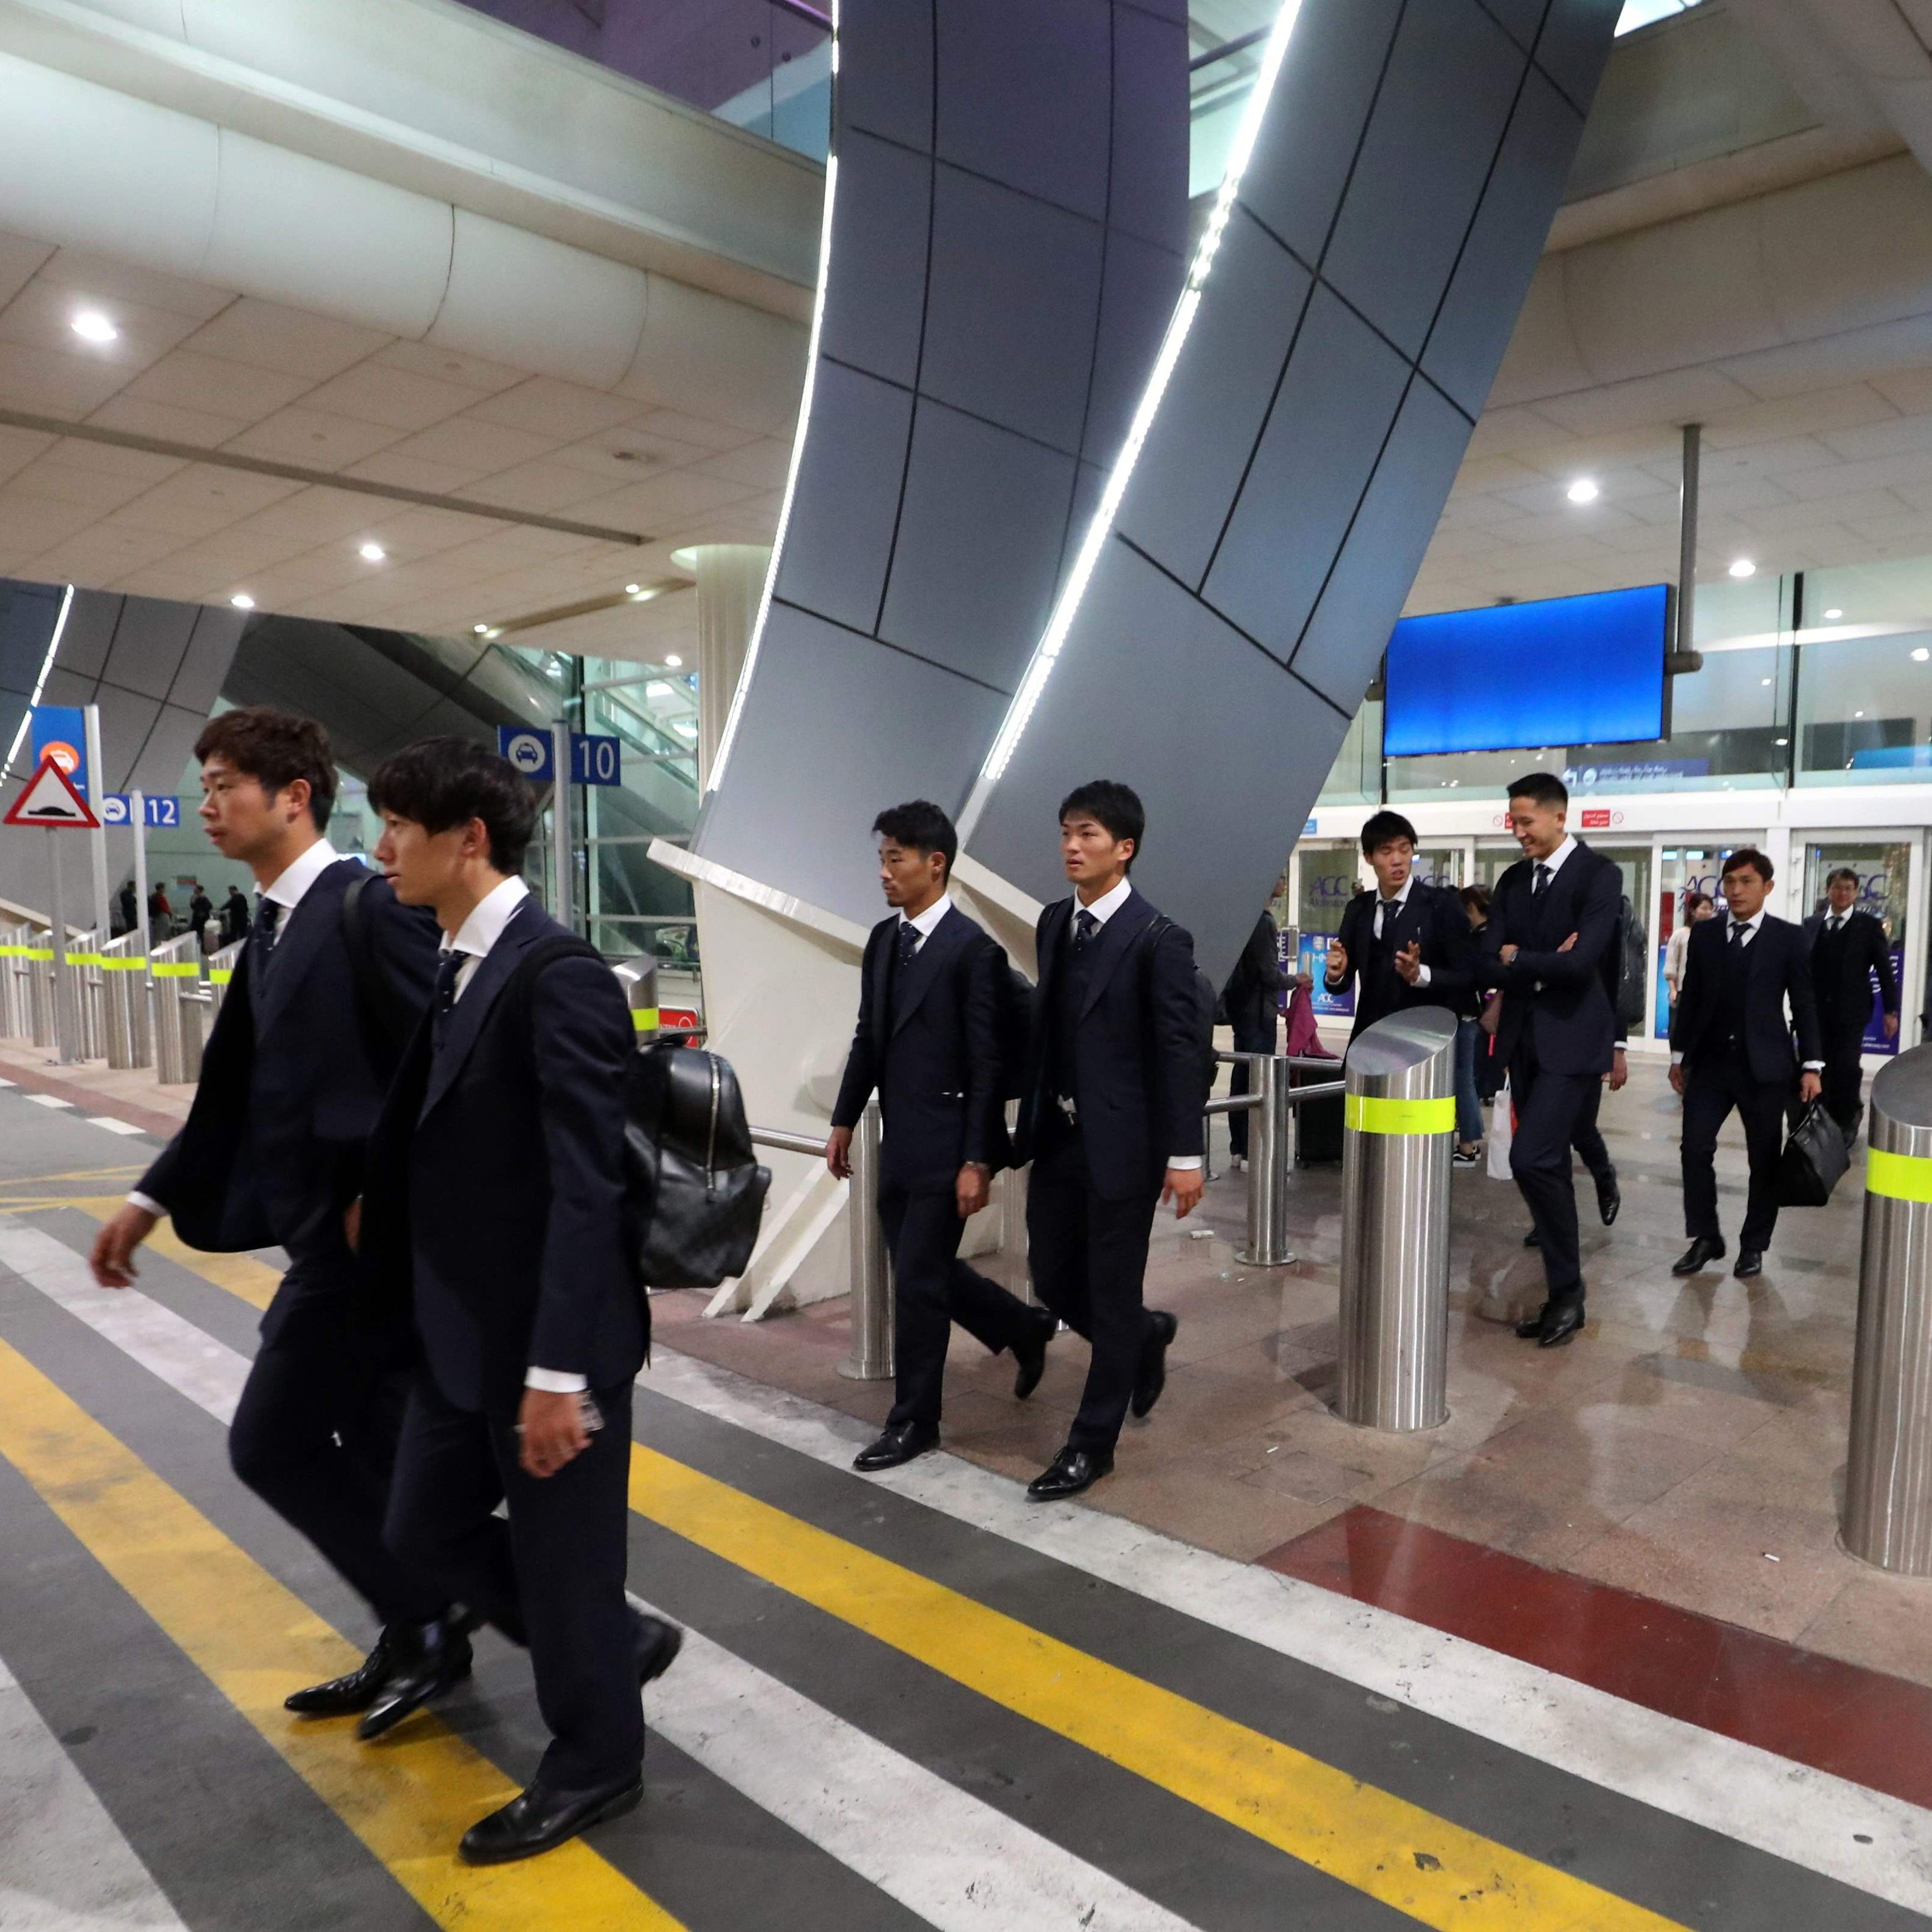 Dubai ranks as the world's busiest international airport